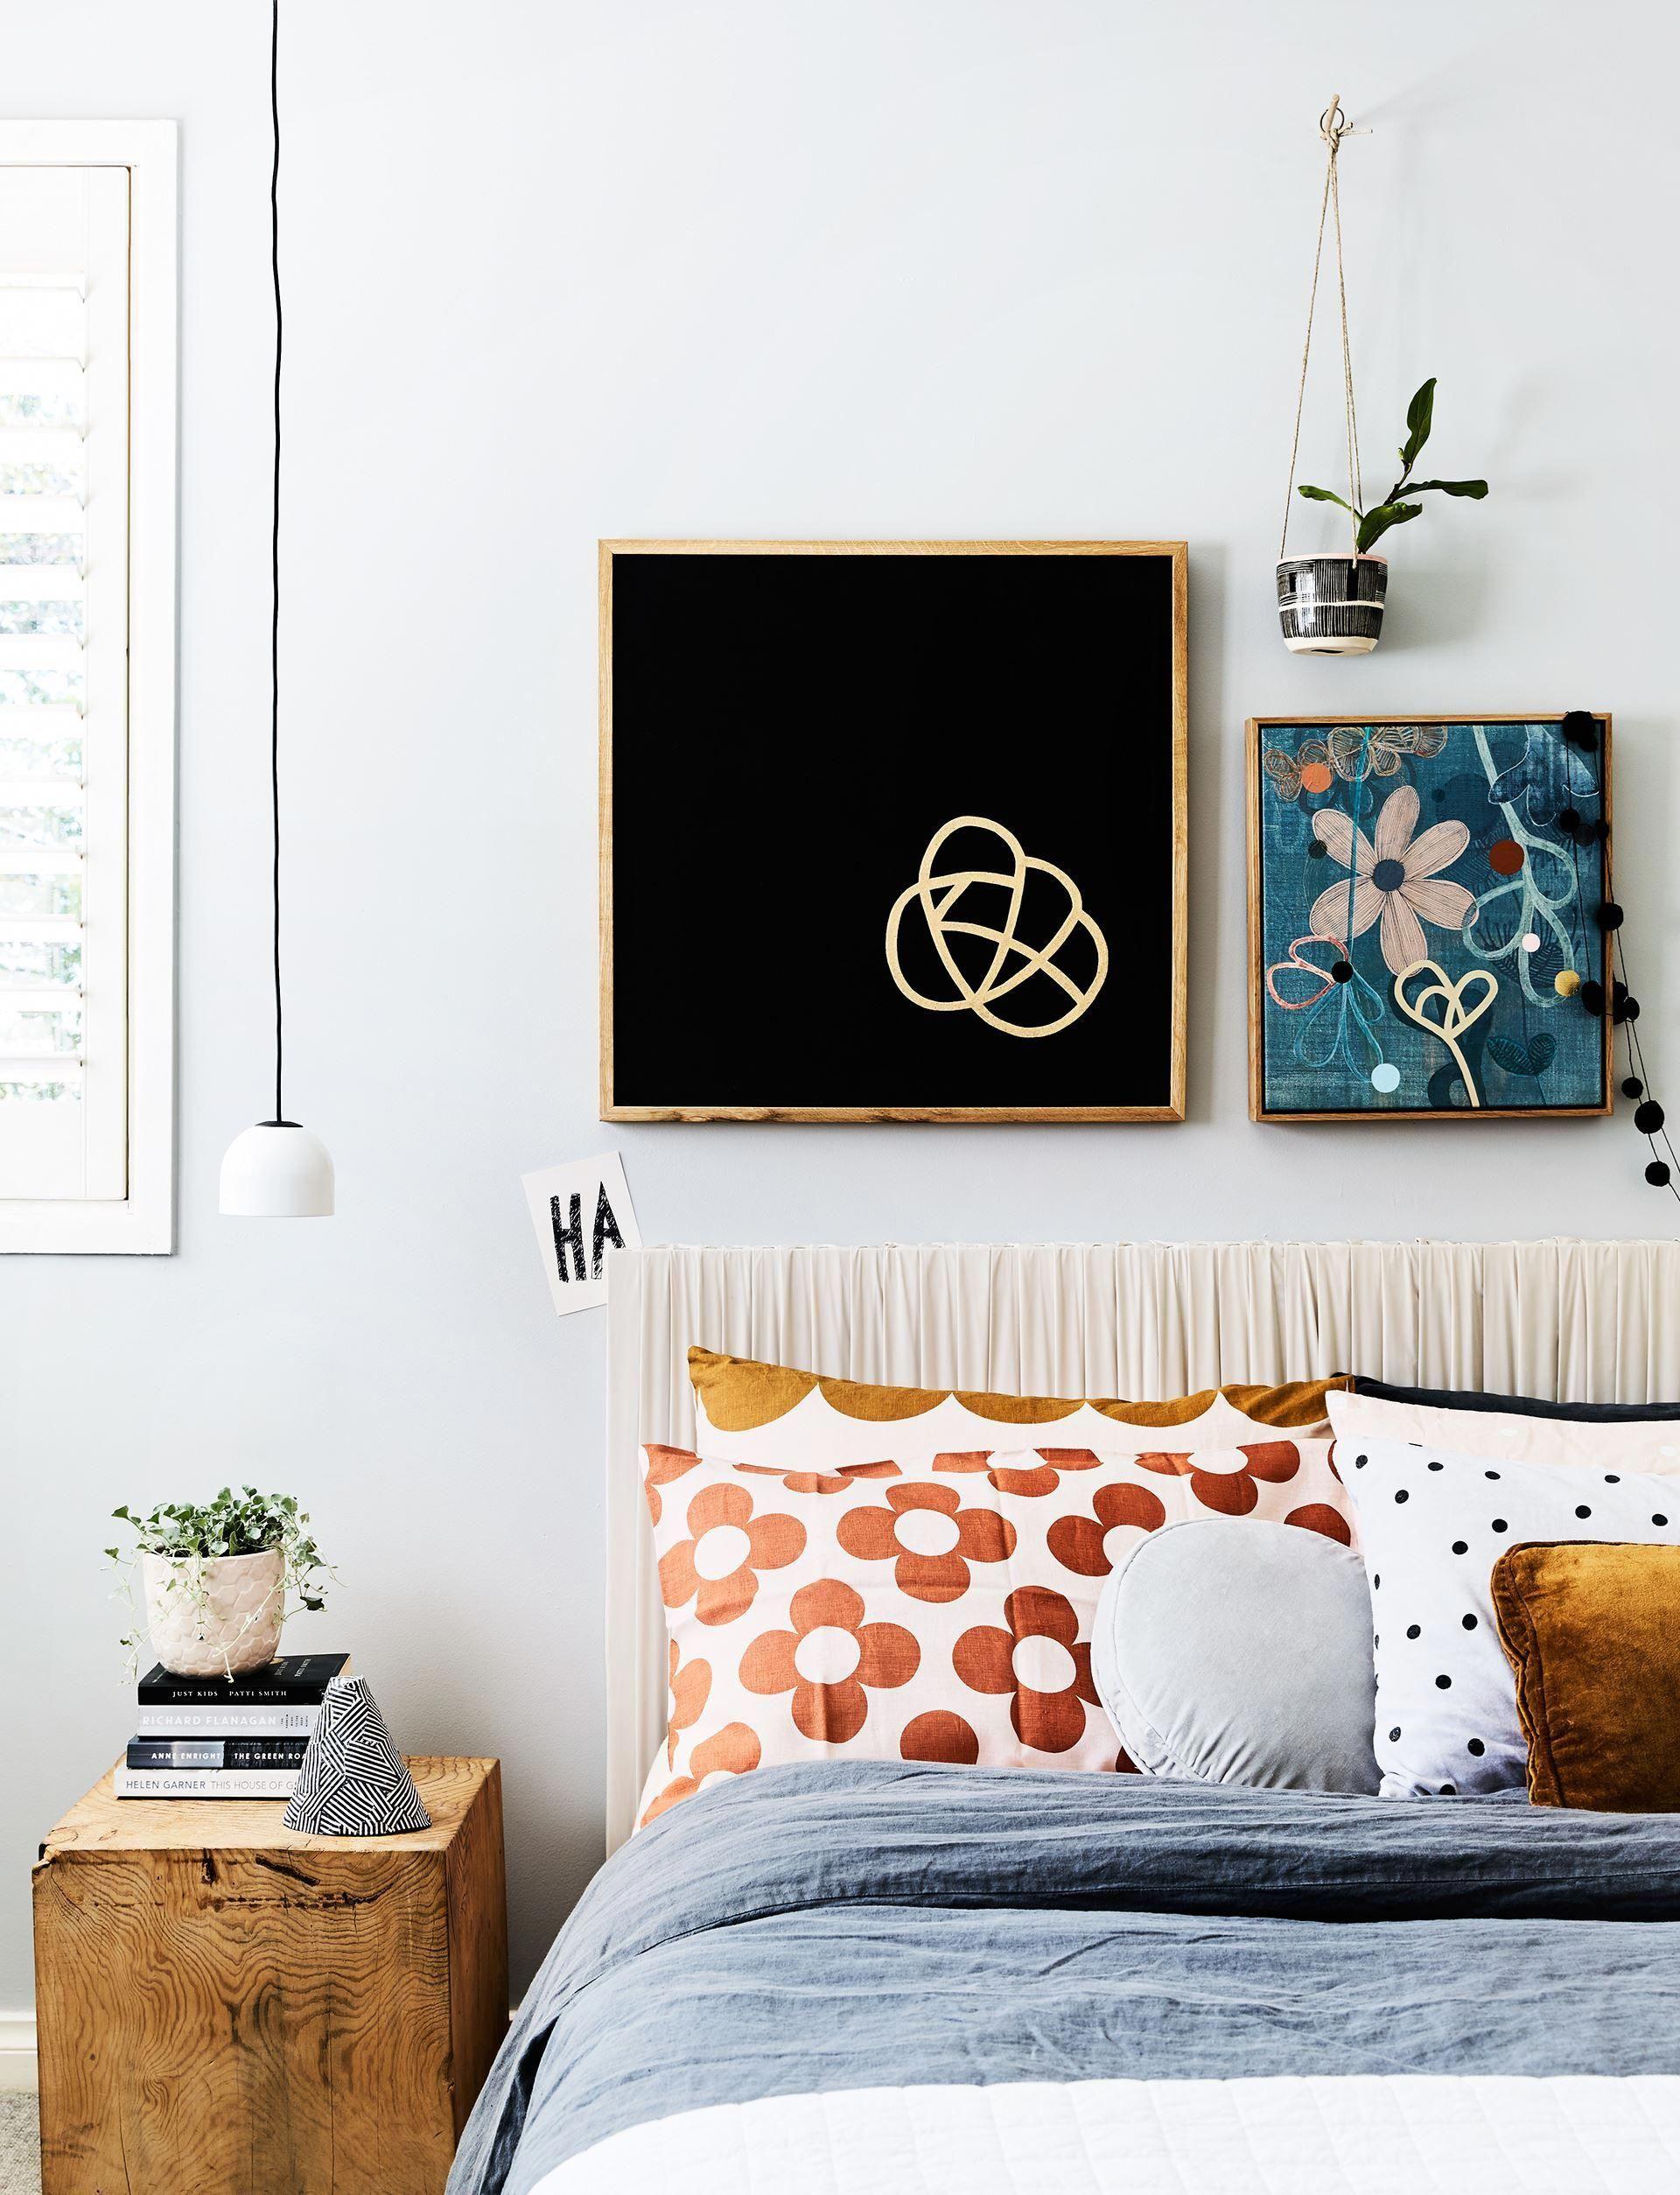 10+ Real living bedroom ideas info cpns terbaru